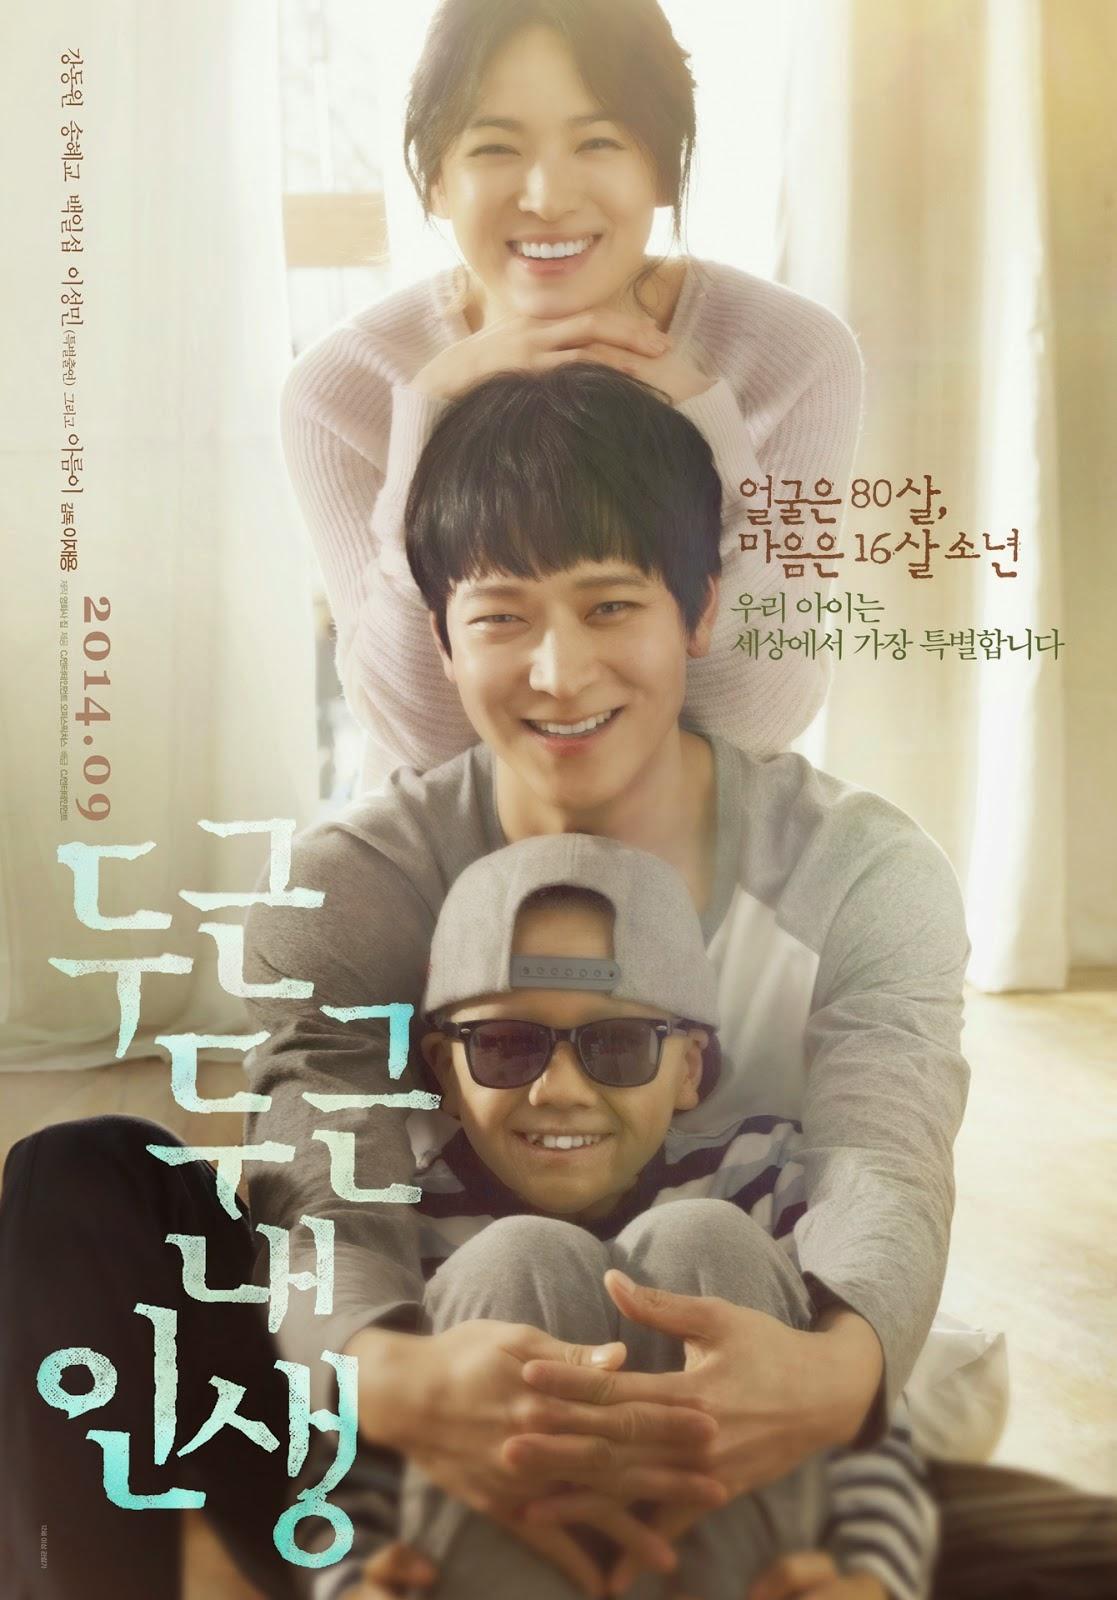 best korean movie My Palpitating Life, Kang Wong Won, drama withdrawal syndrome